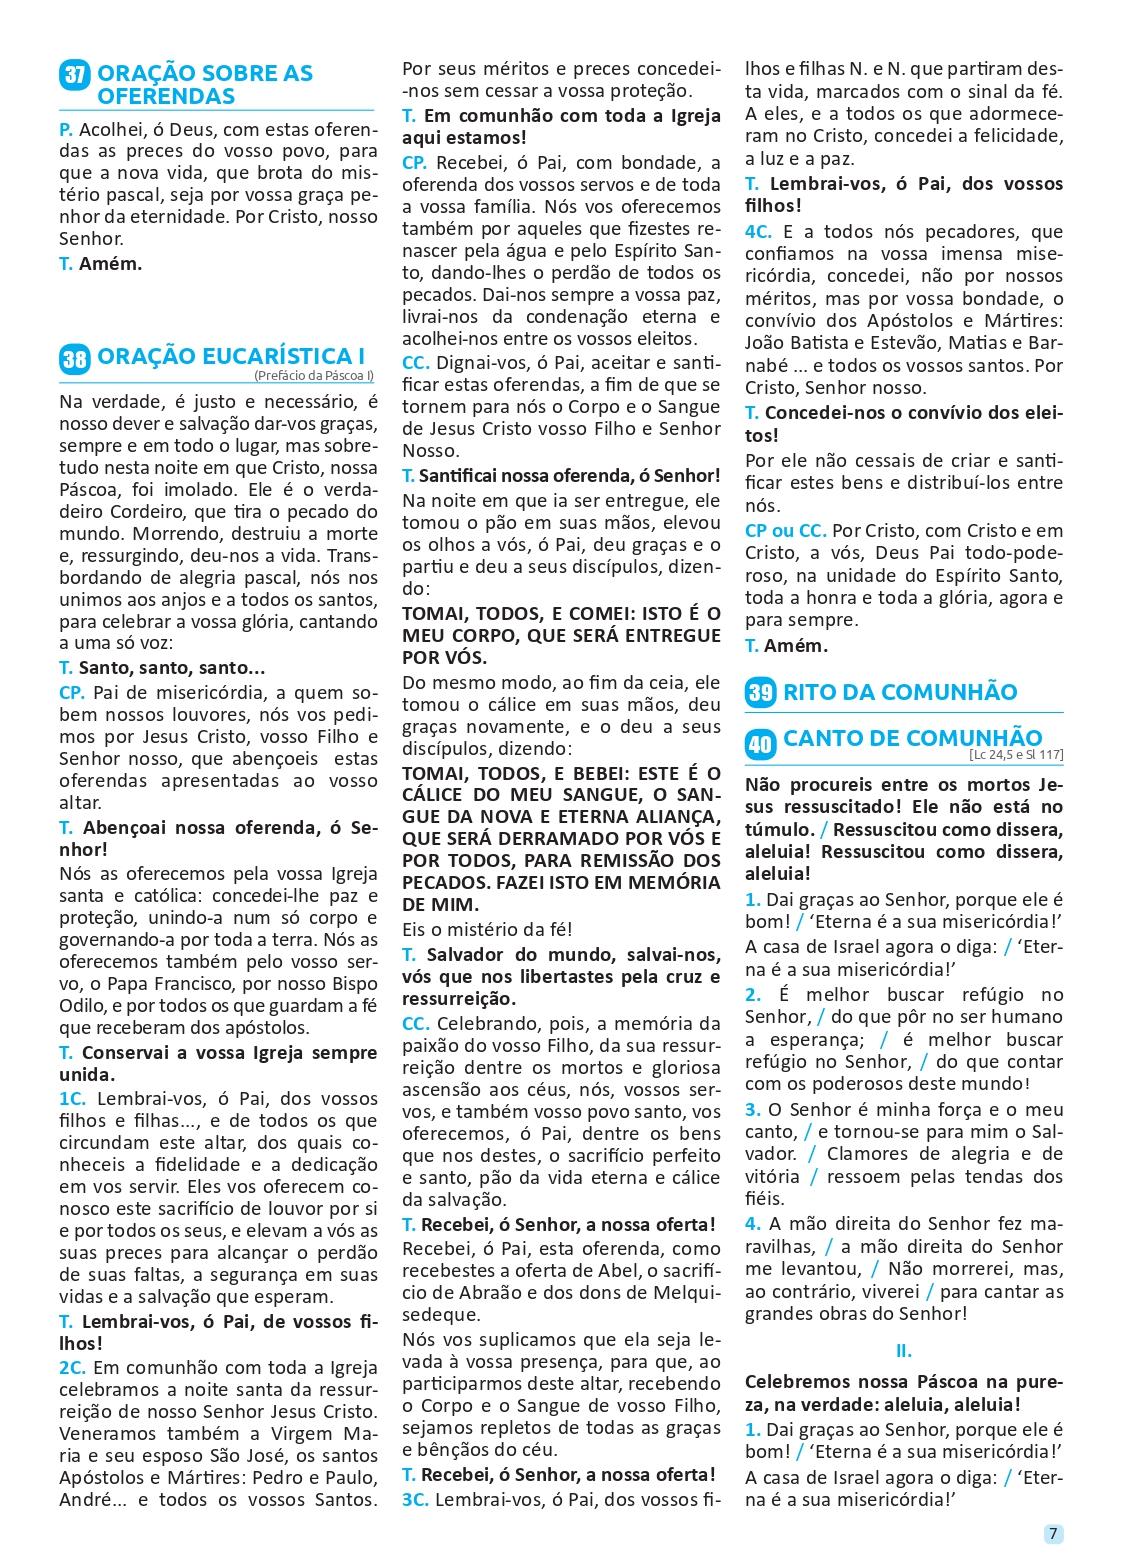 ano_44-a_-_20_-_sabado_santo_vigilia_pascal_2_pages-to-jpg-0007